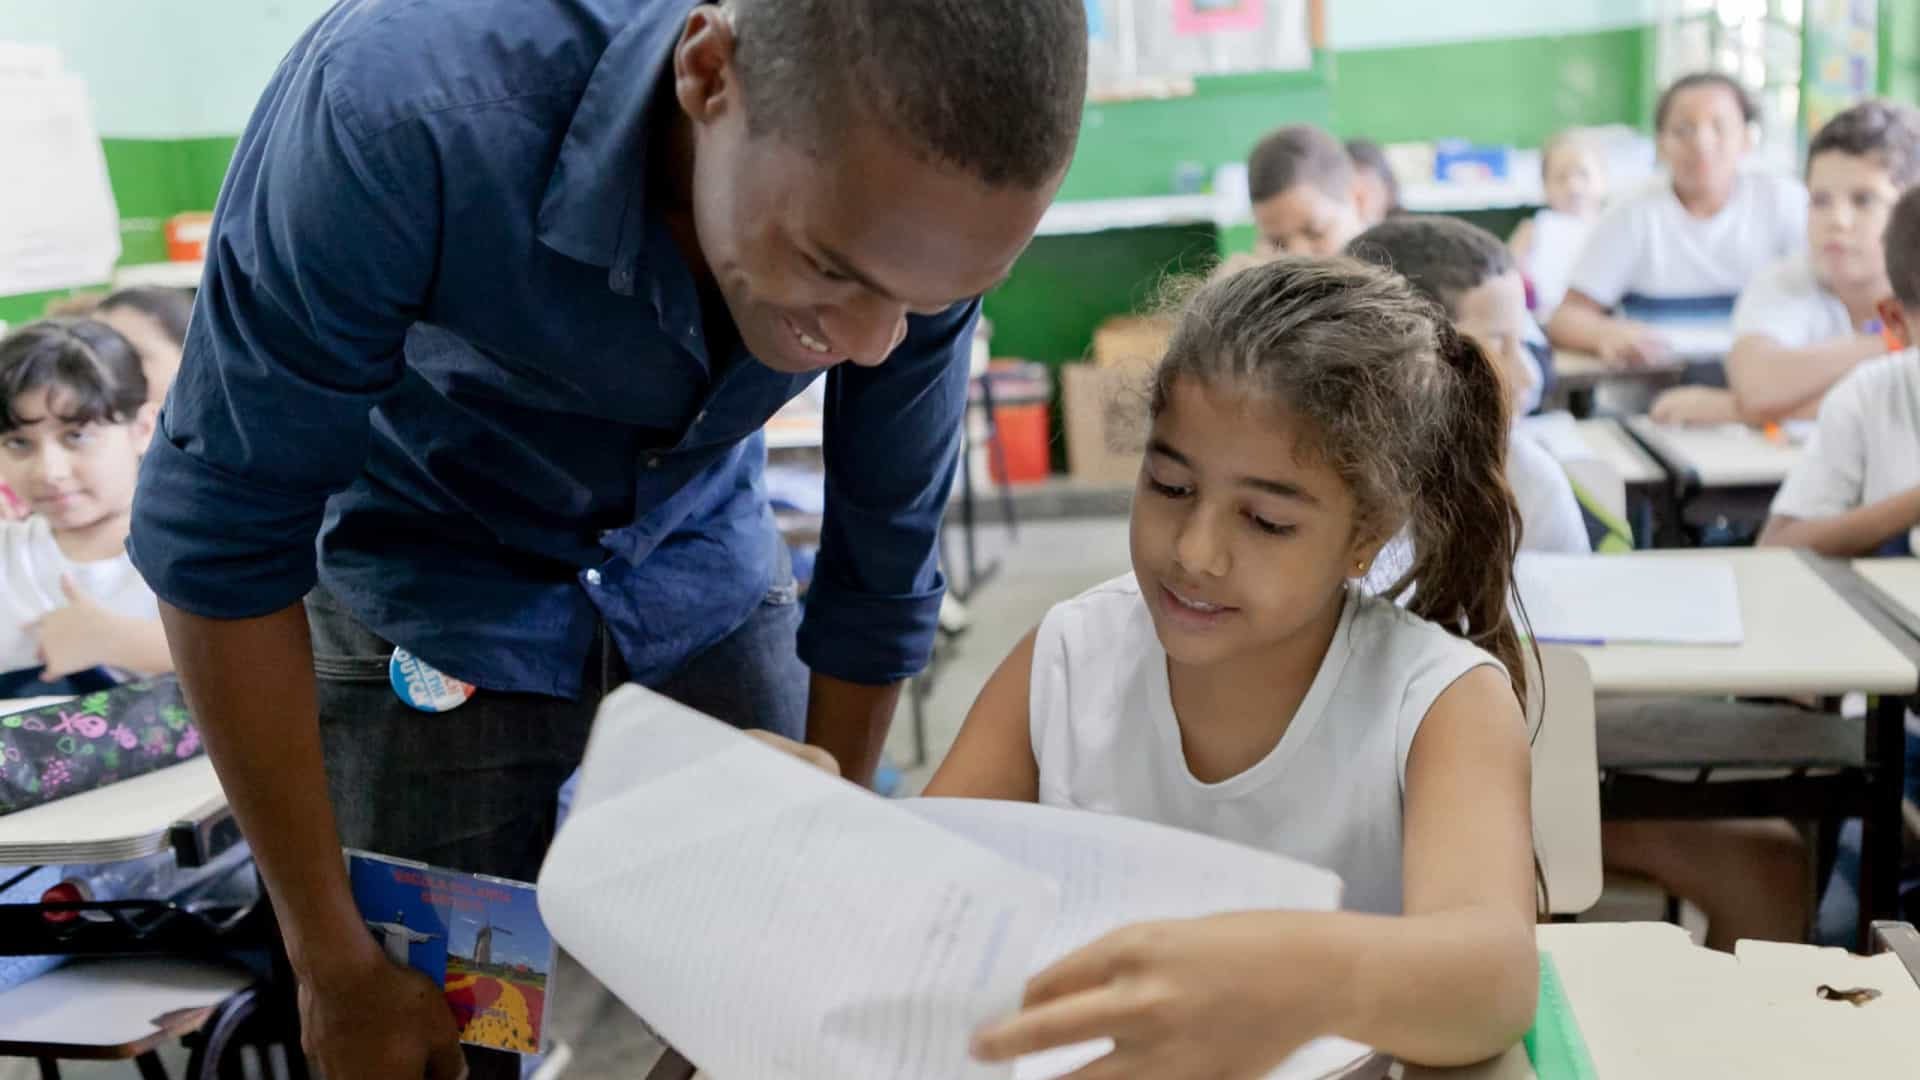 Grupo de pediatras considera seguro escolas infantis abertas durante pandemia